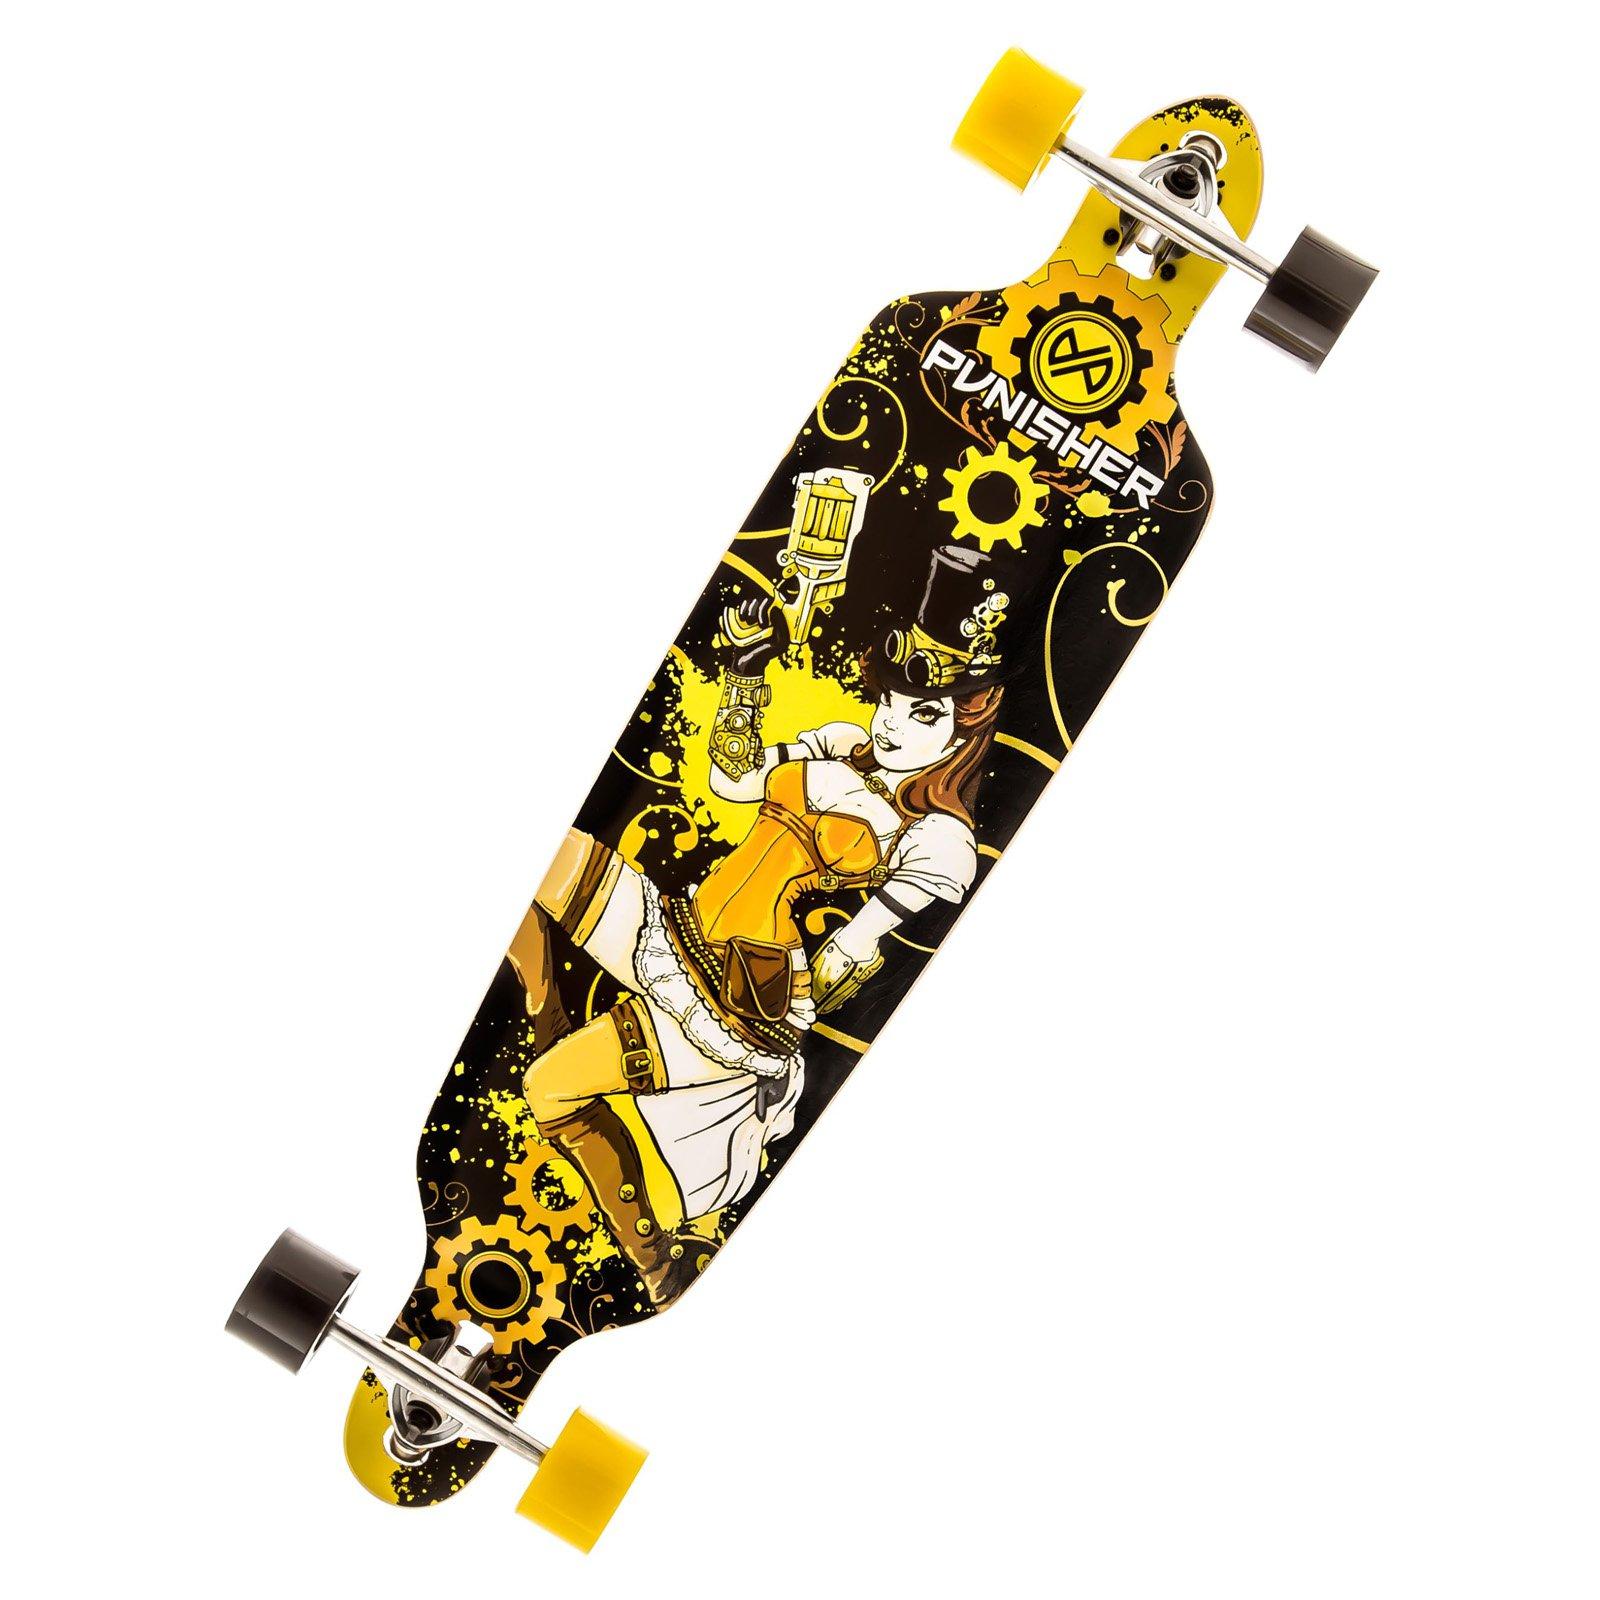 "Punisher Skateboards Steampunk 40"" Longboard, Double Kick with Drop Down Deck"